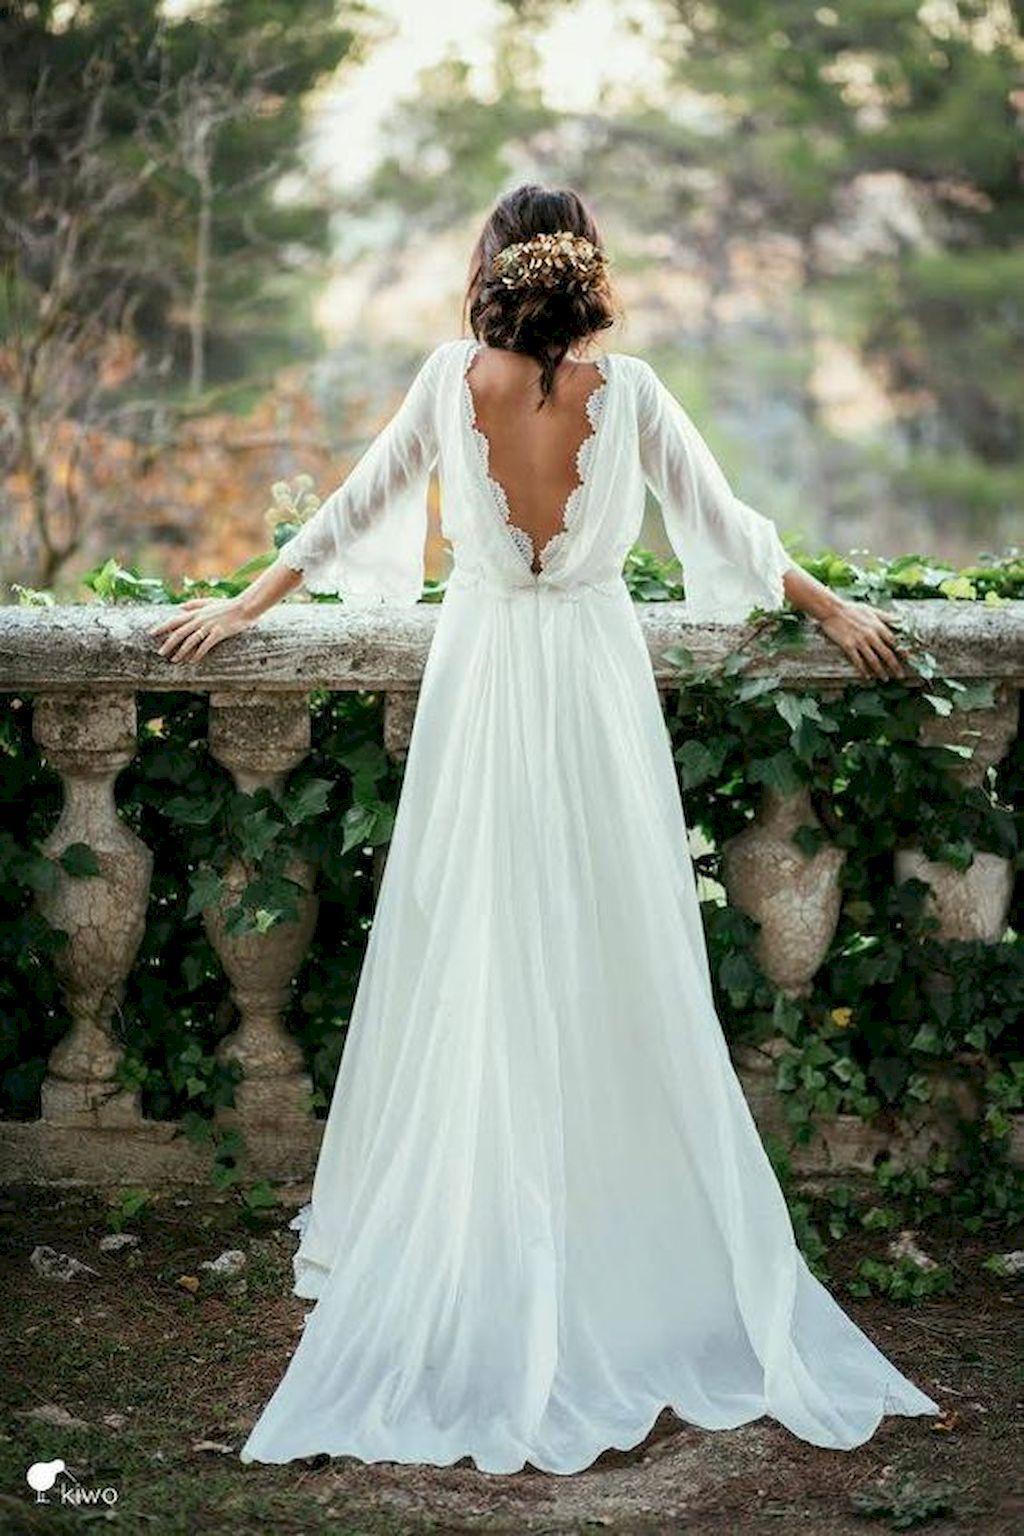 70 Favourite Fall Long Sleeve Wedding Dresses Ideas Bitecloth Com Wedding Dress Long Sleeve Backless Wedding Elegant Wedding Dress [ 1536 x 1024 Pixel ]